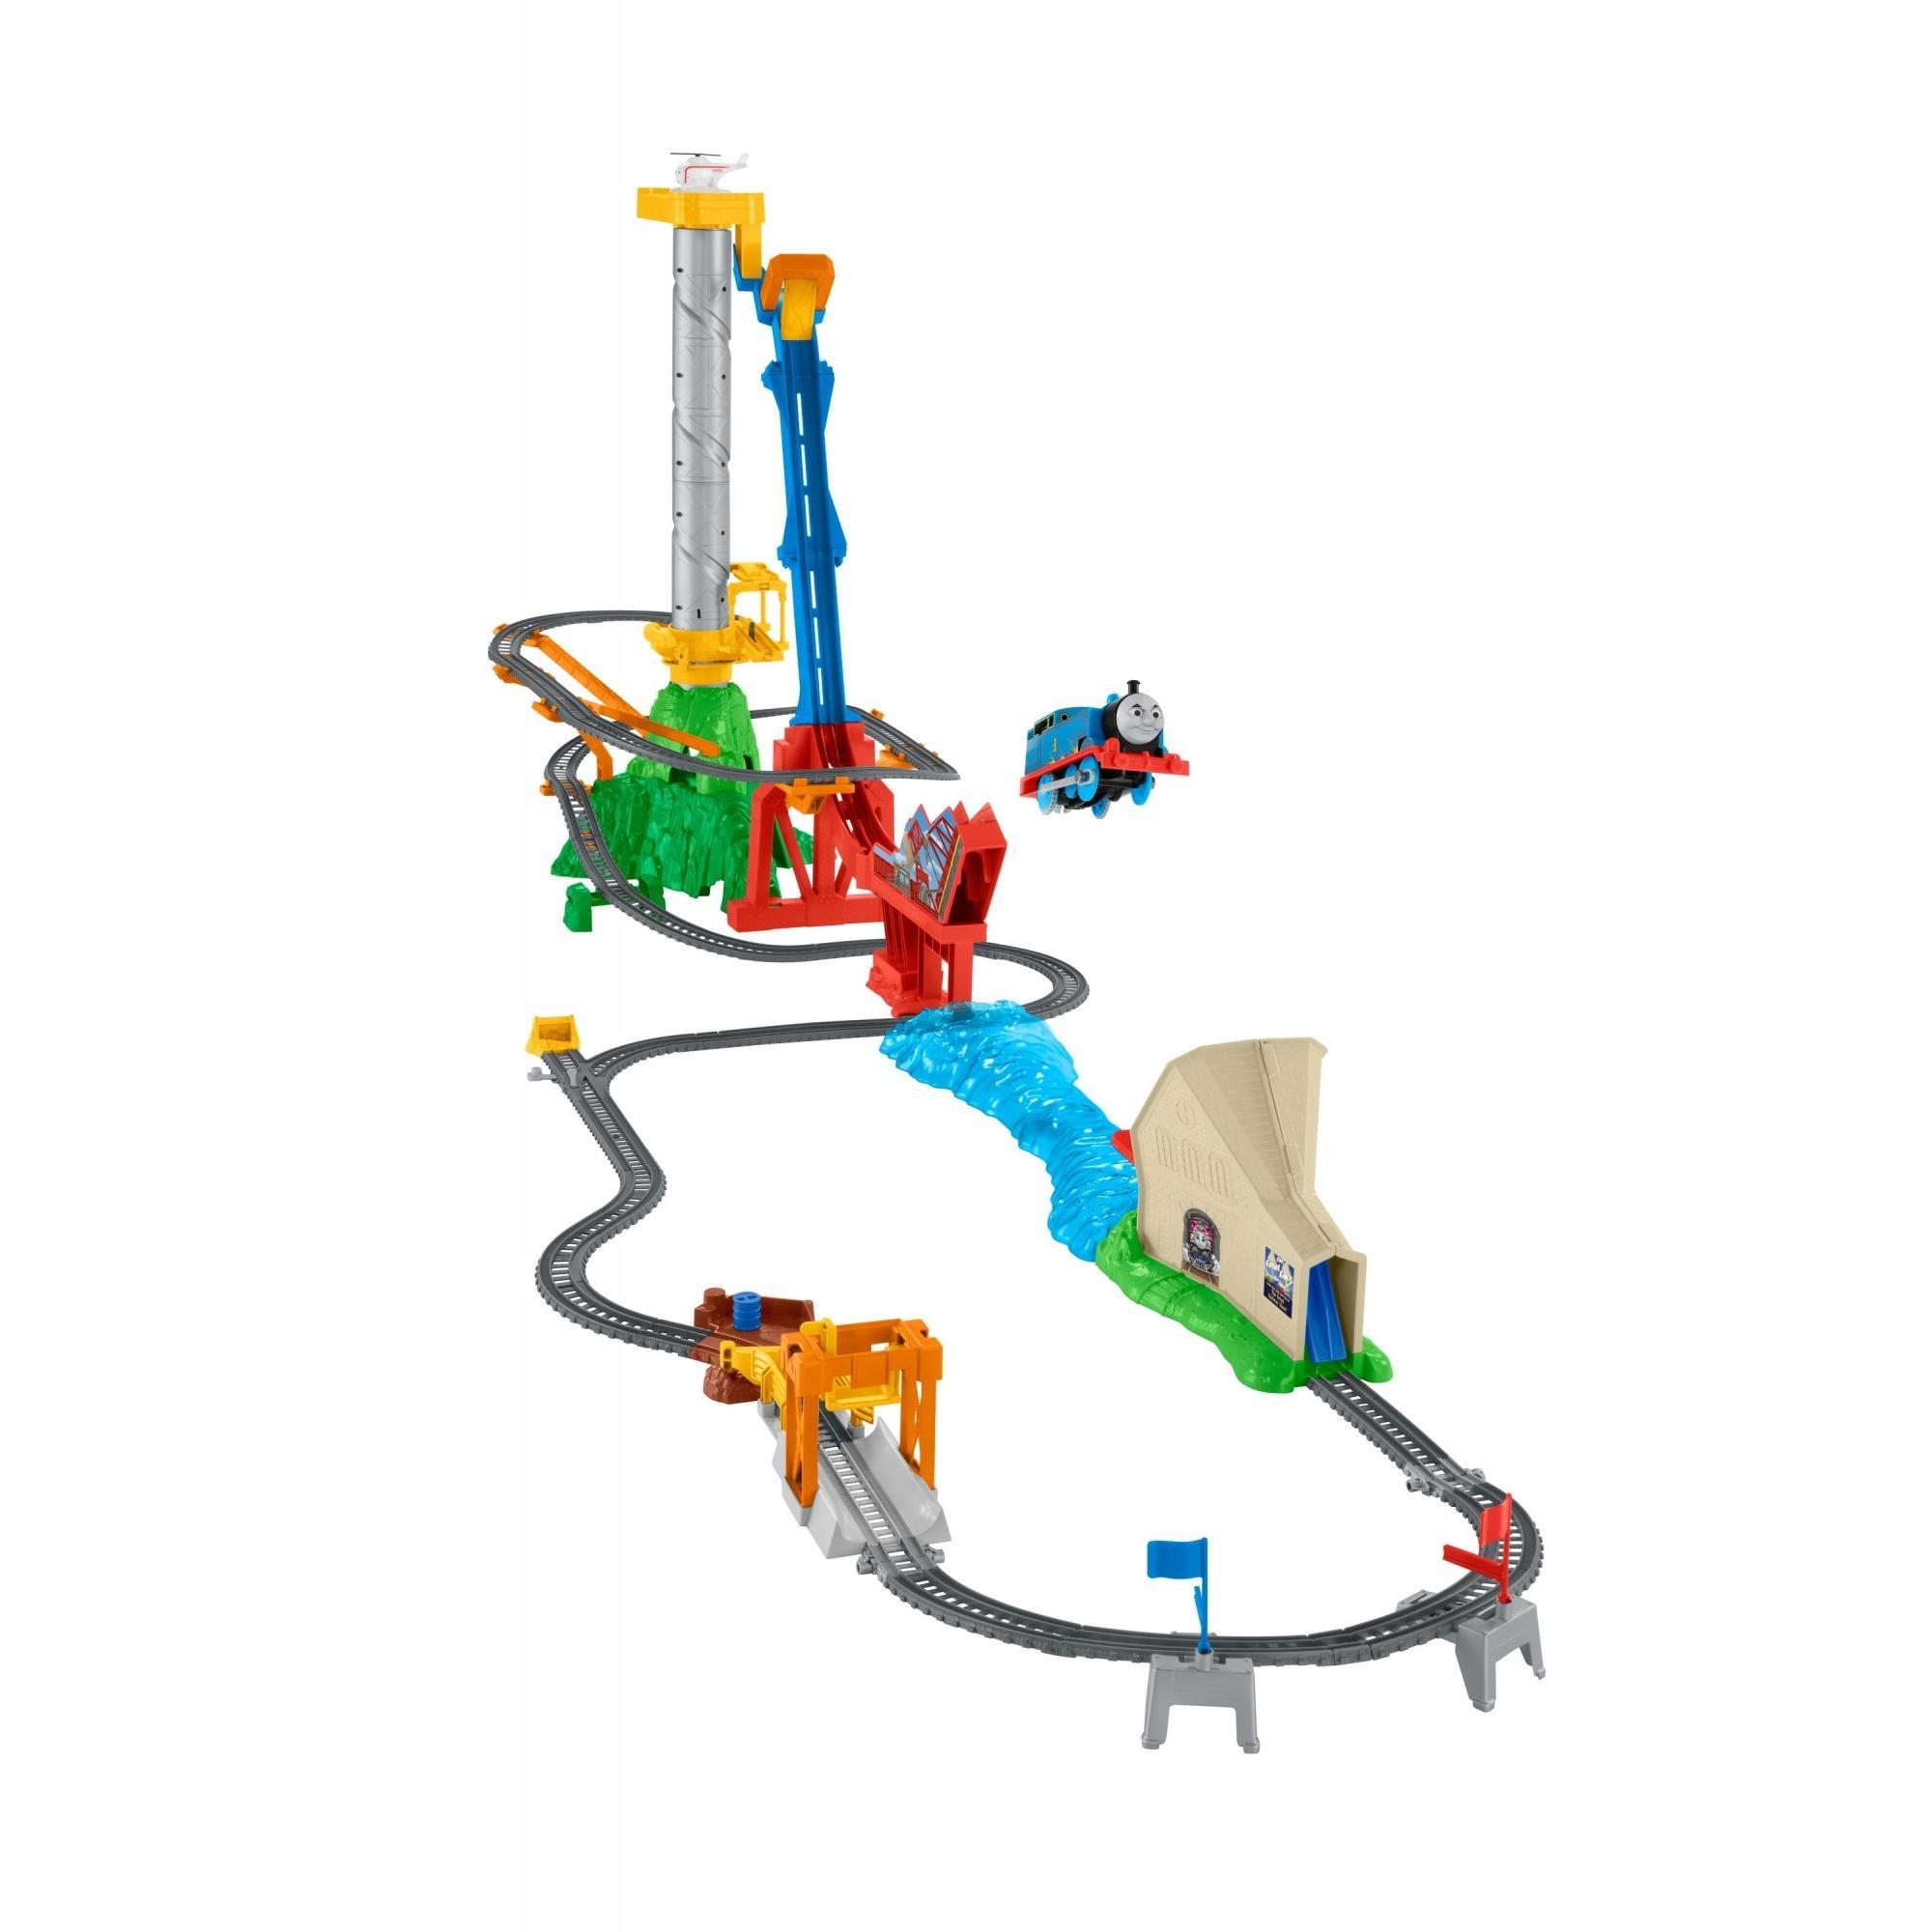 Fisher Price Thomas & Friends TrackMaster Thomas' Sky-High Bridge Jump Train by Thomas %26 Friends